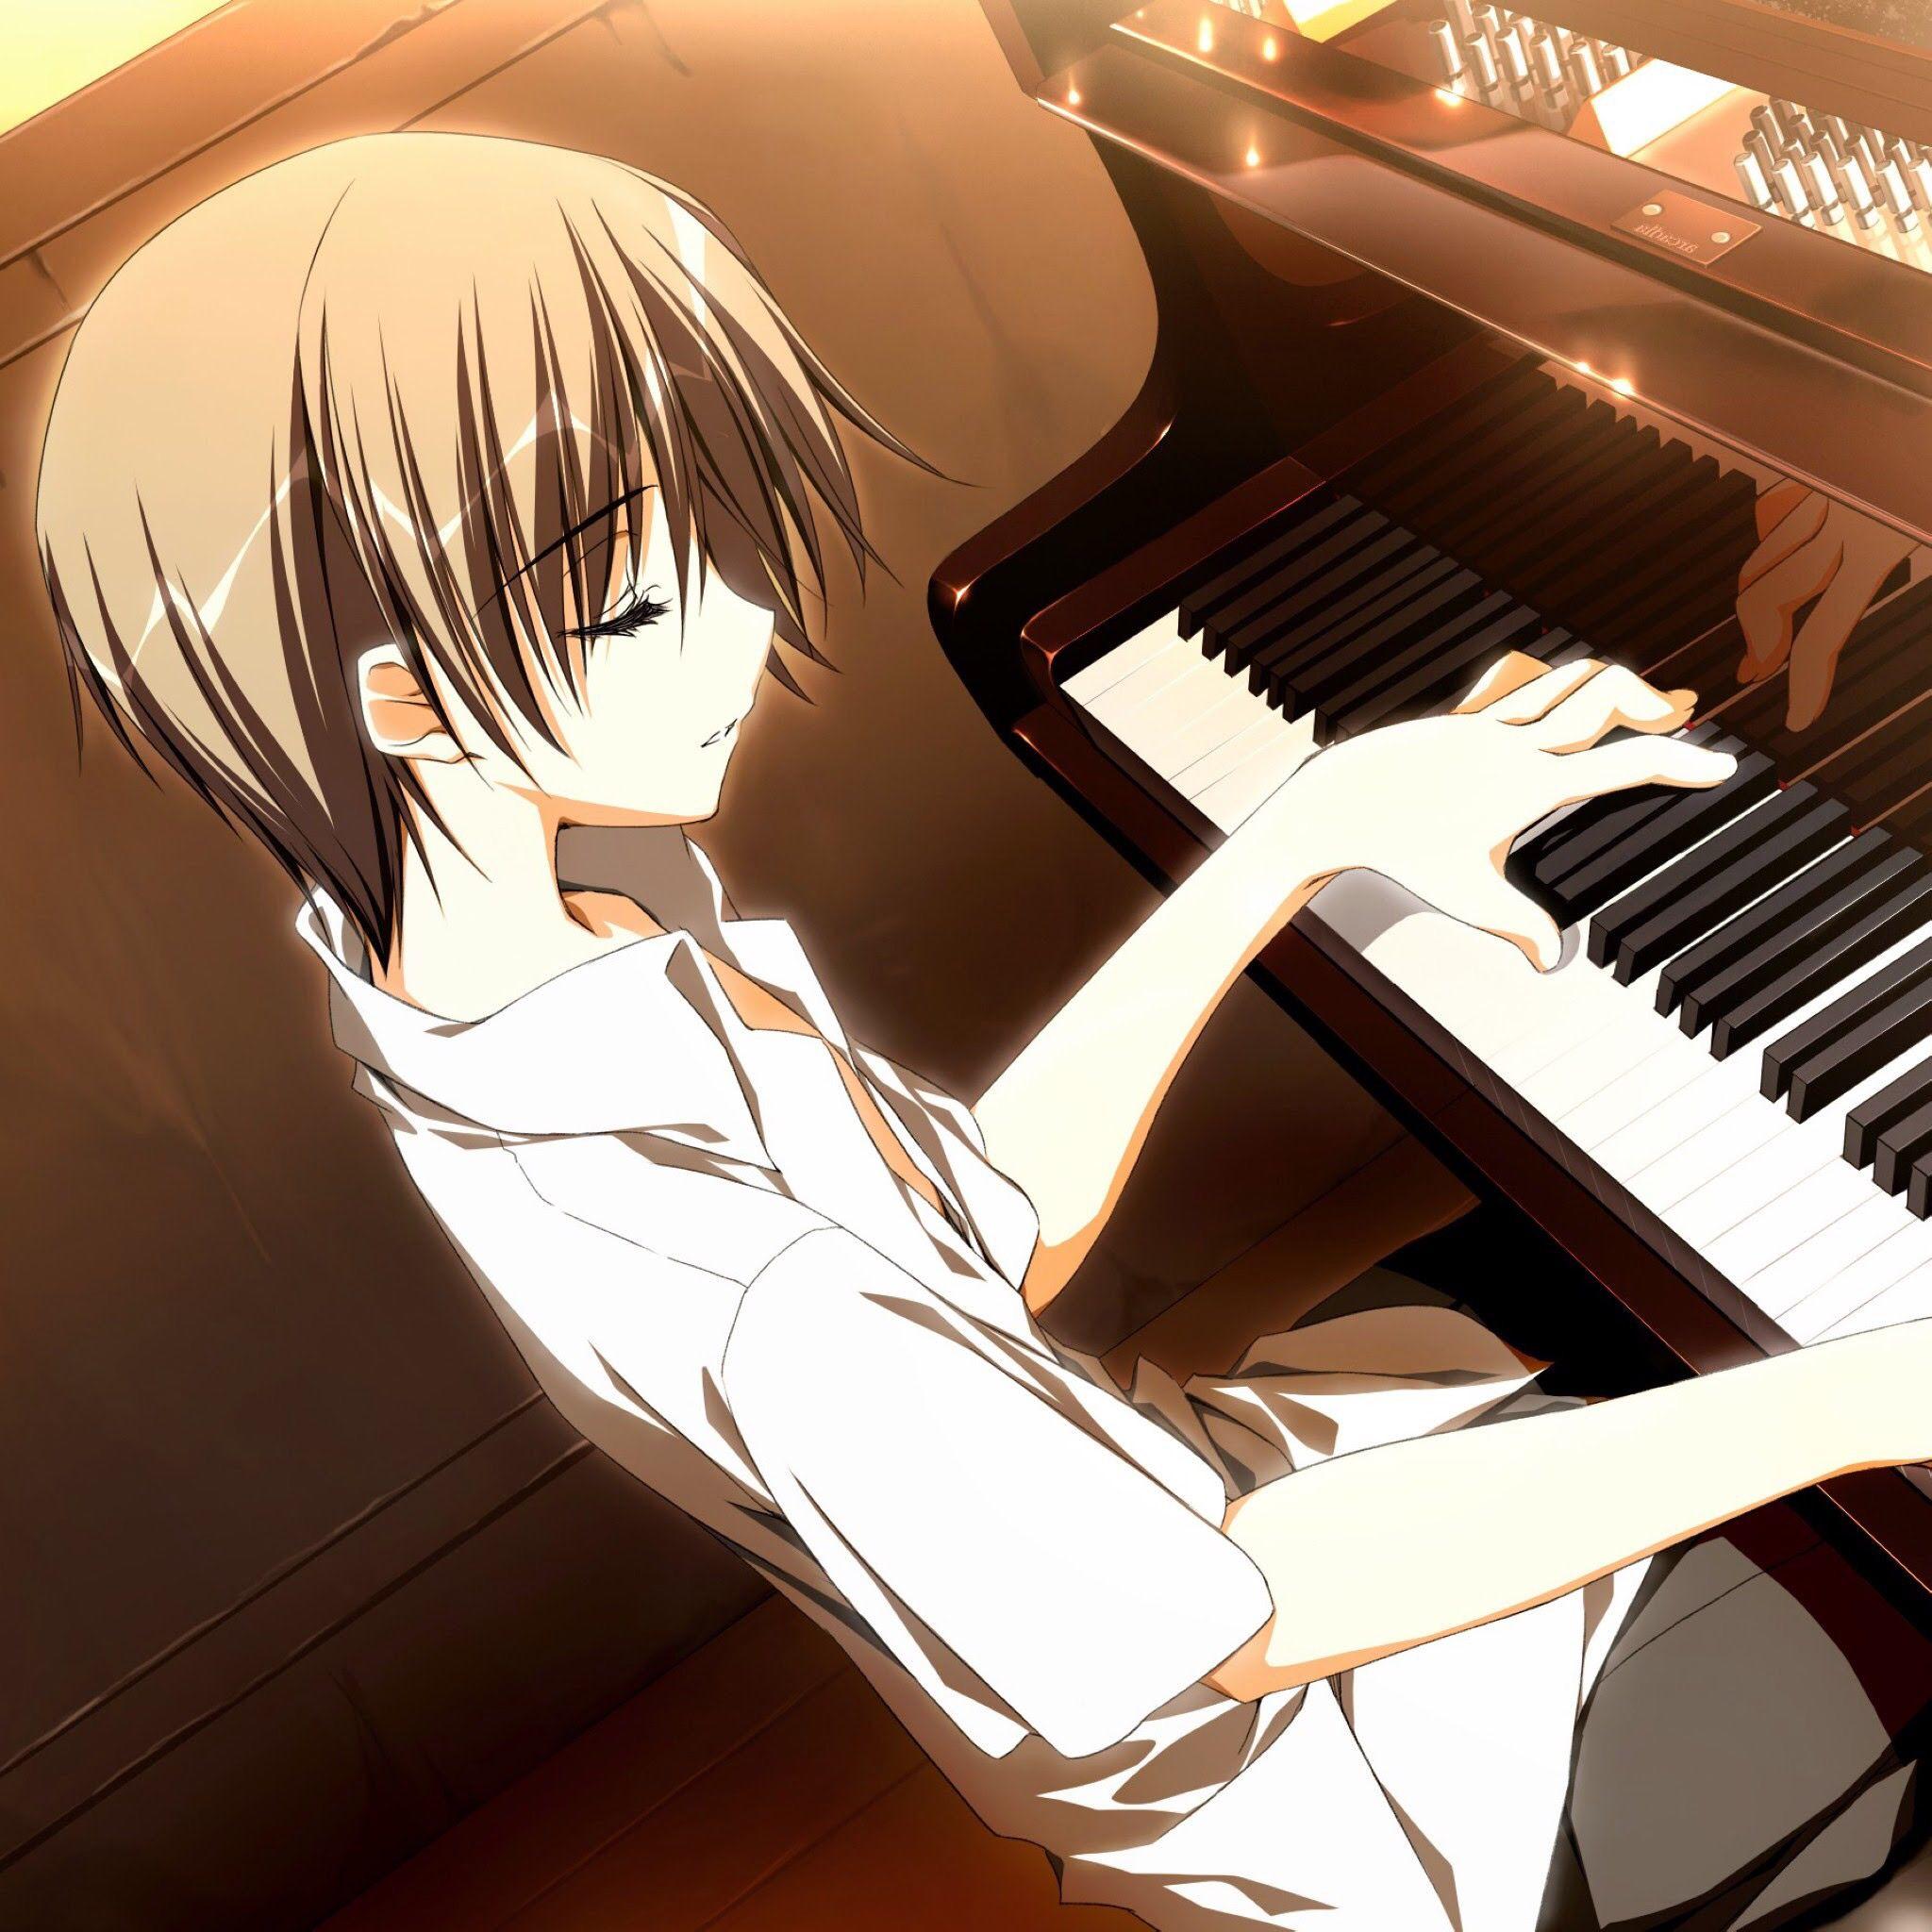 Hot Anime Guy Playing Piano Piano Anime Anime Music Top 5 Anime